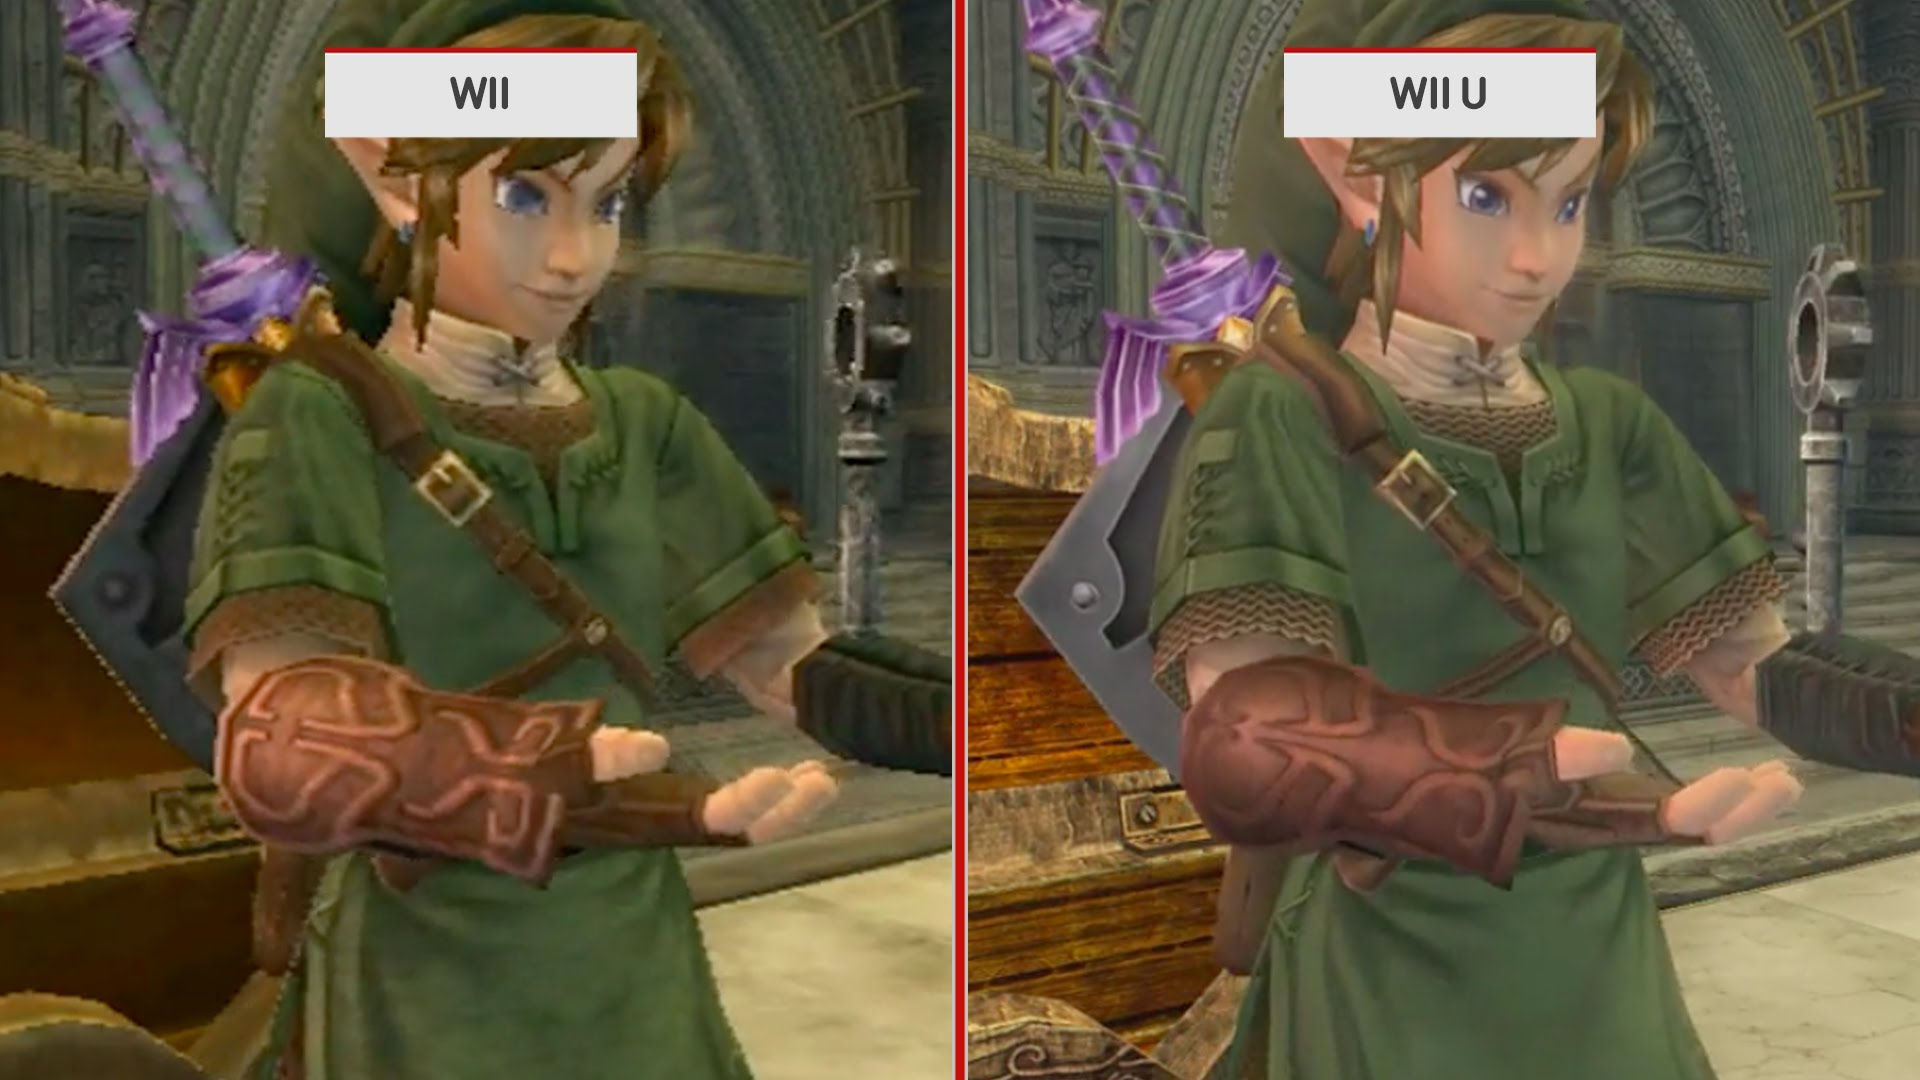 Most Viewed The Legend Of Zelda Twilight Princess Wallpapers 4k